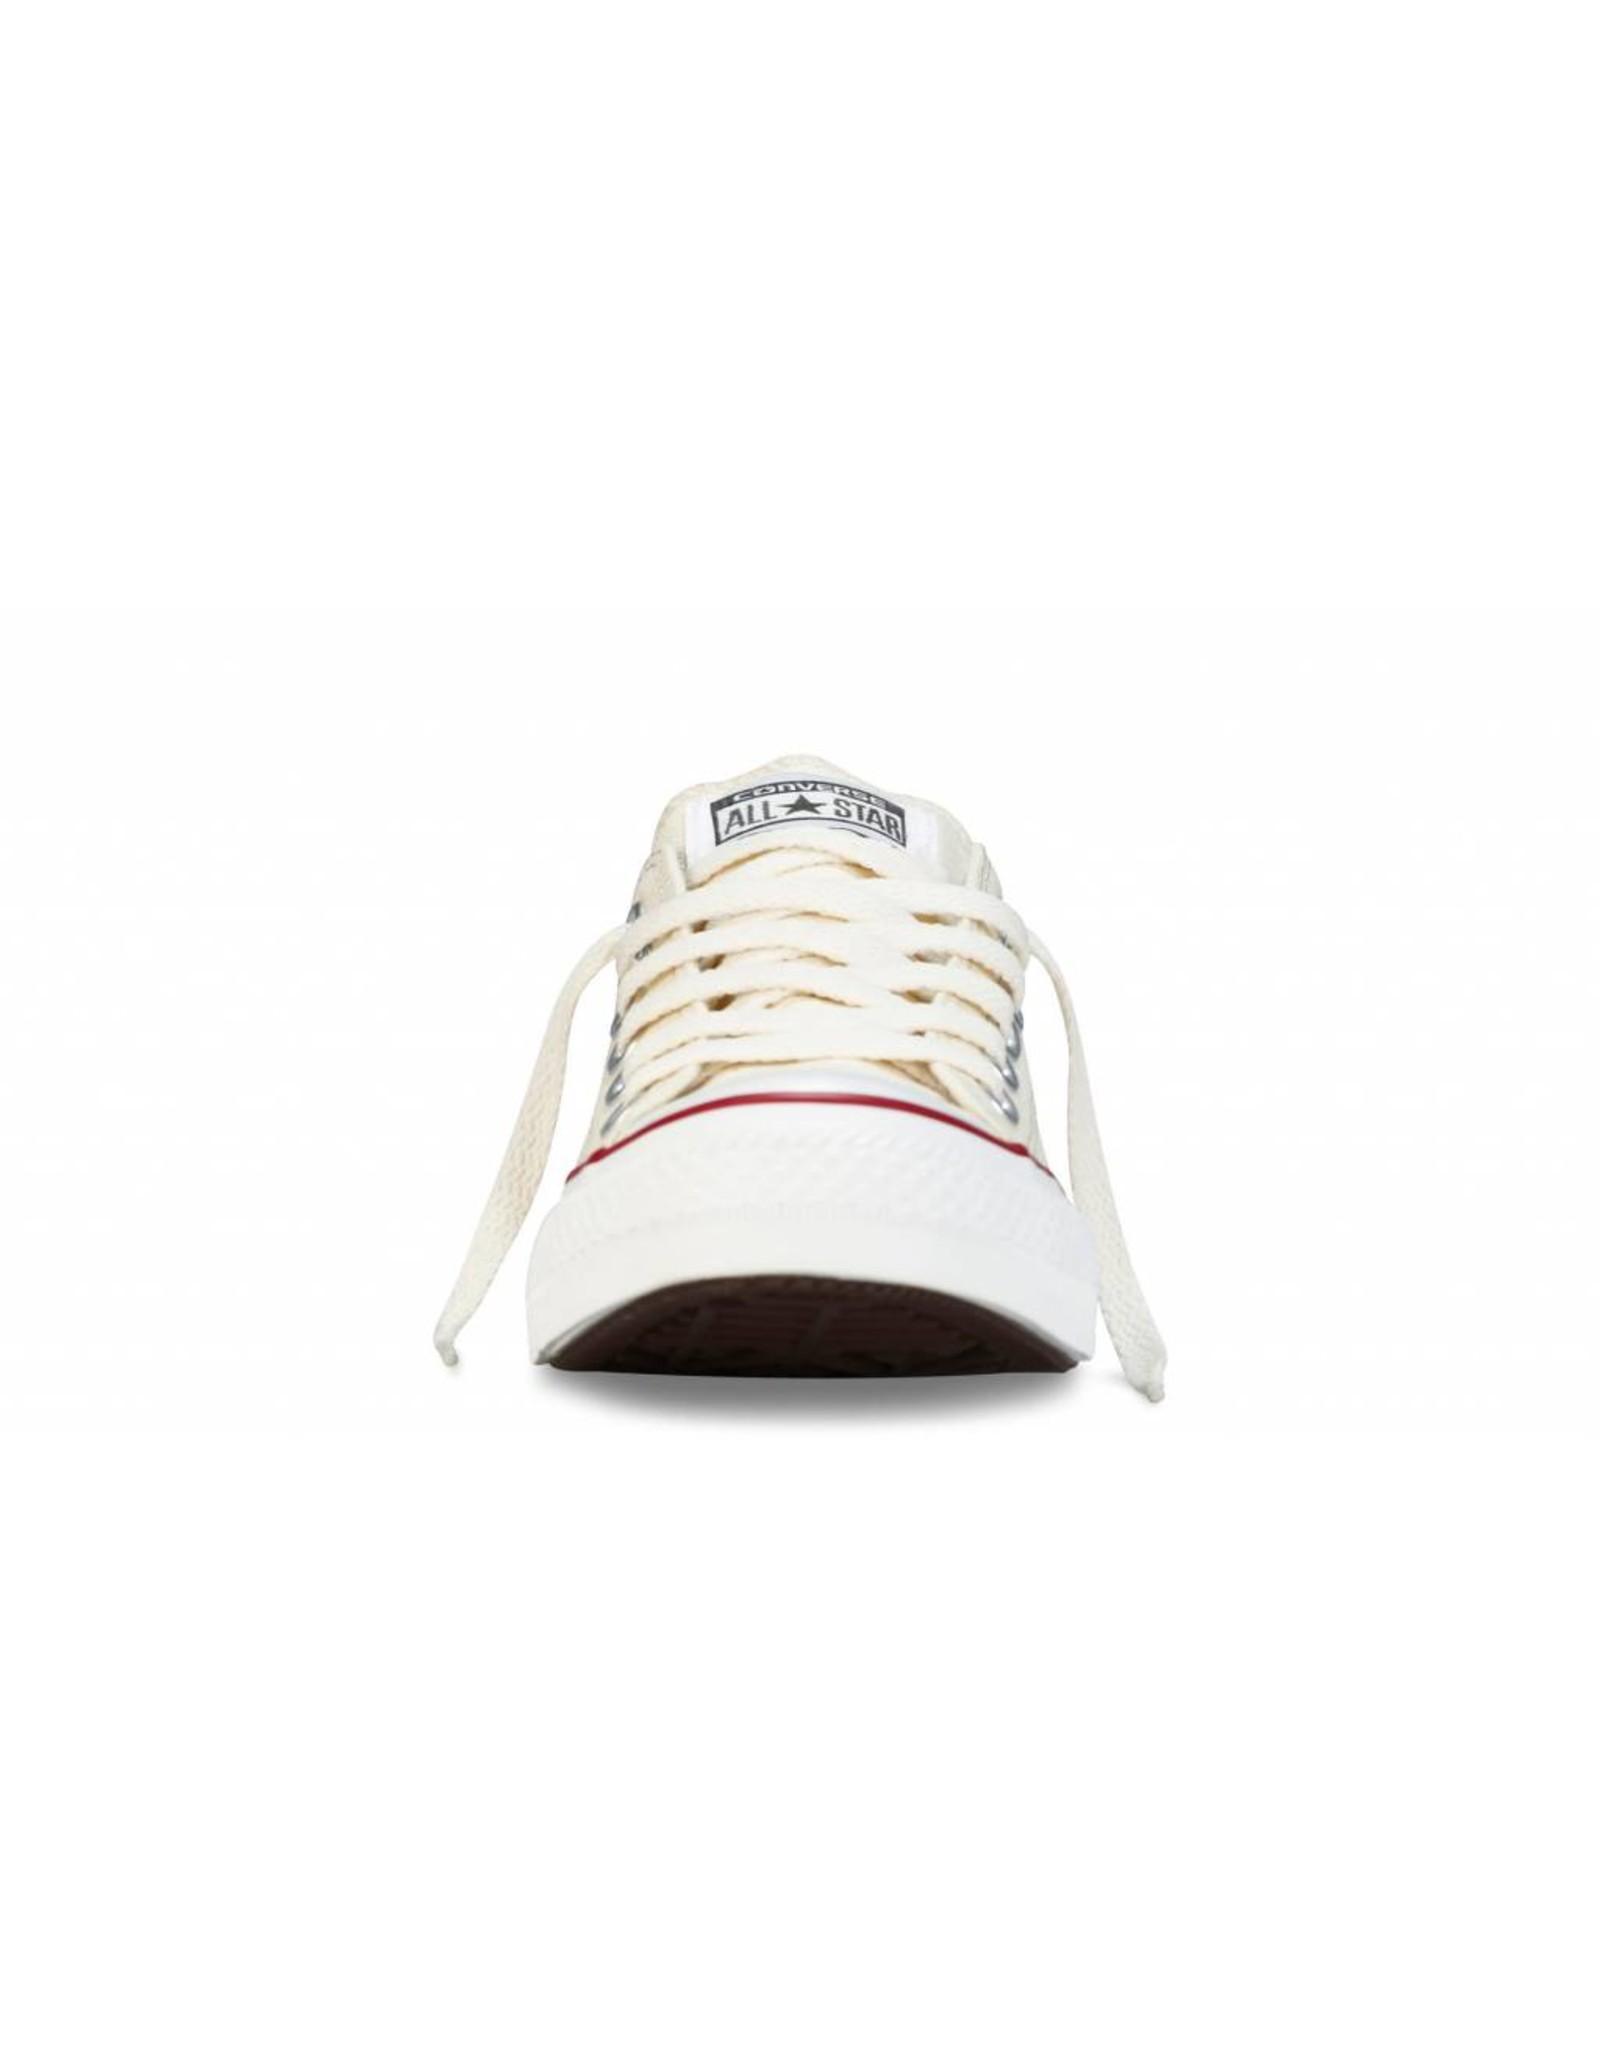 CONVERSE CHUCK TAYLOR OX NATURAL WHITE C2W-M9165C